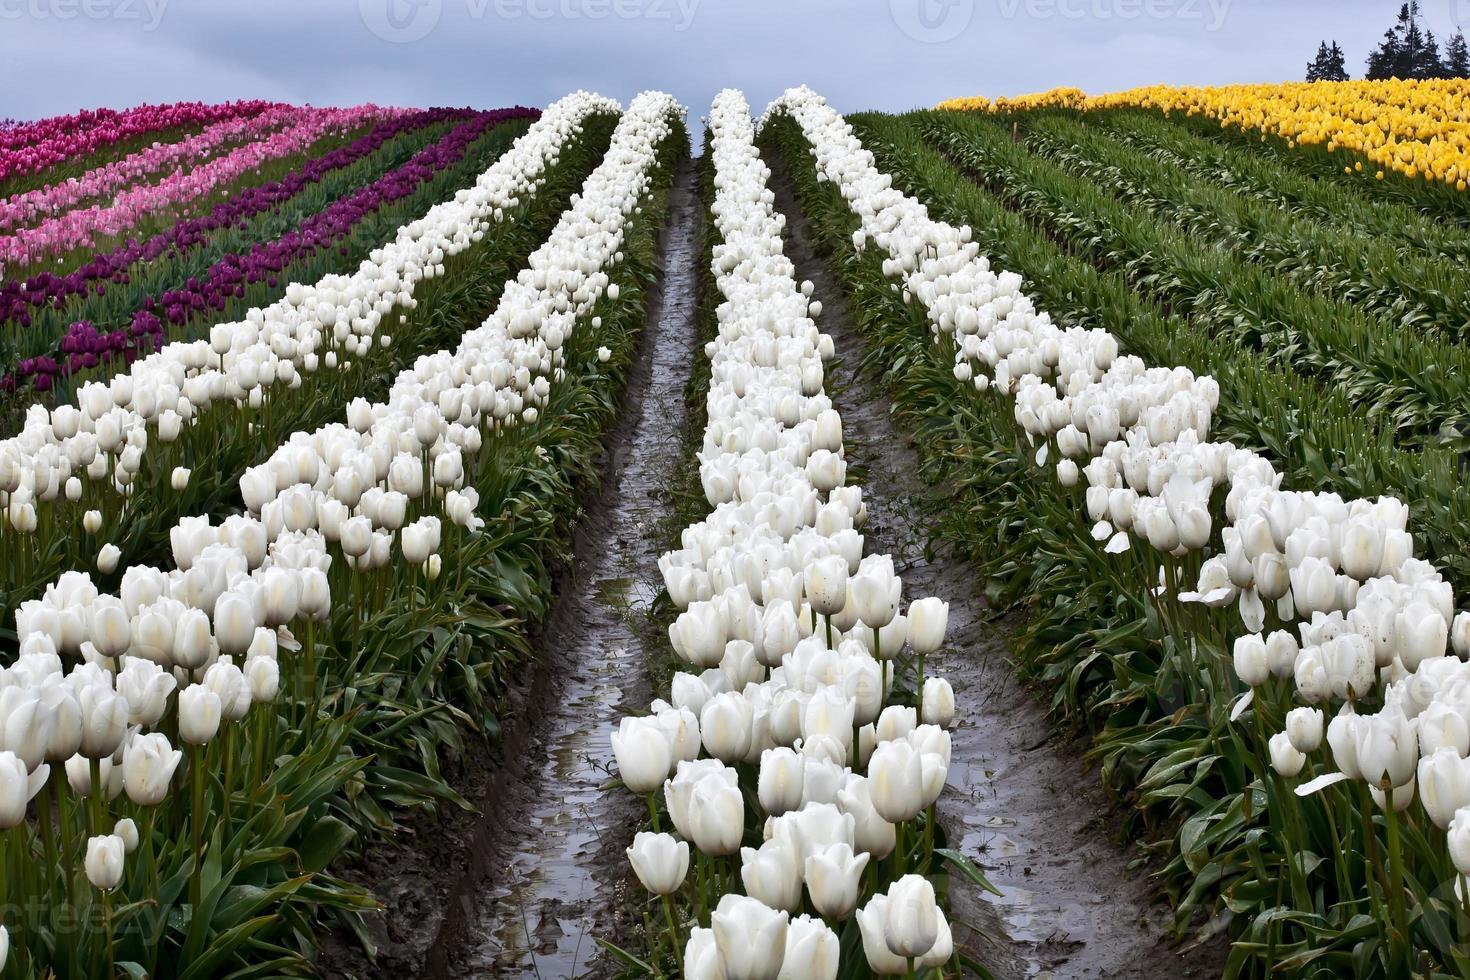 tulipán blanco colinas flores valle de skagit estado de washington foto